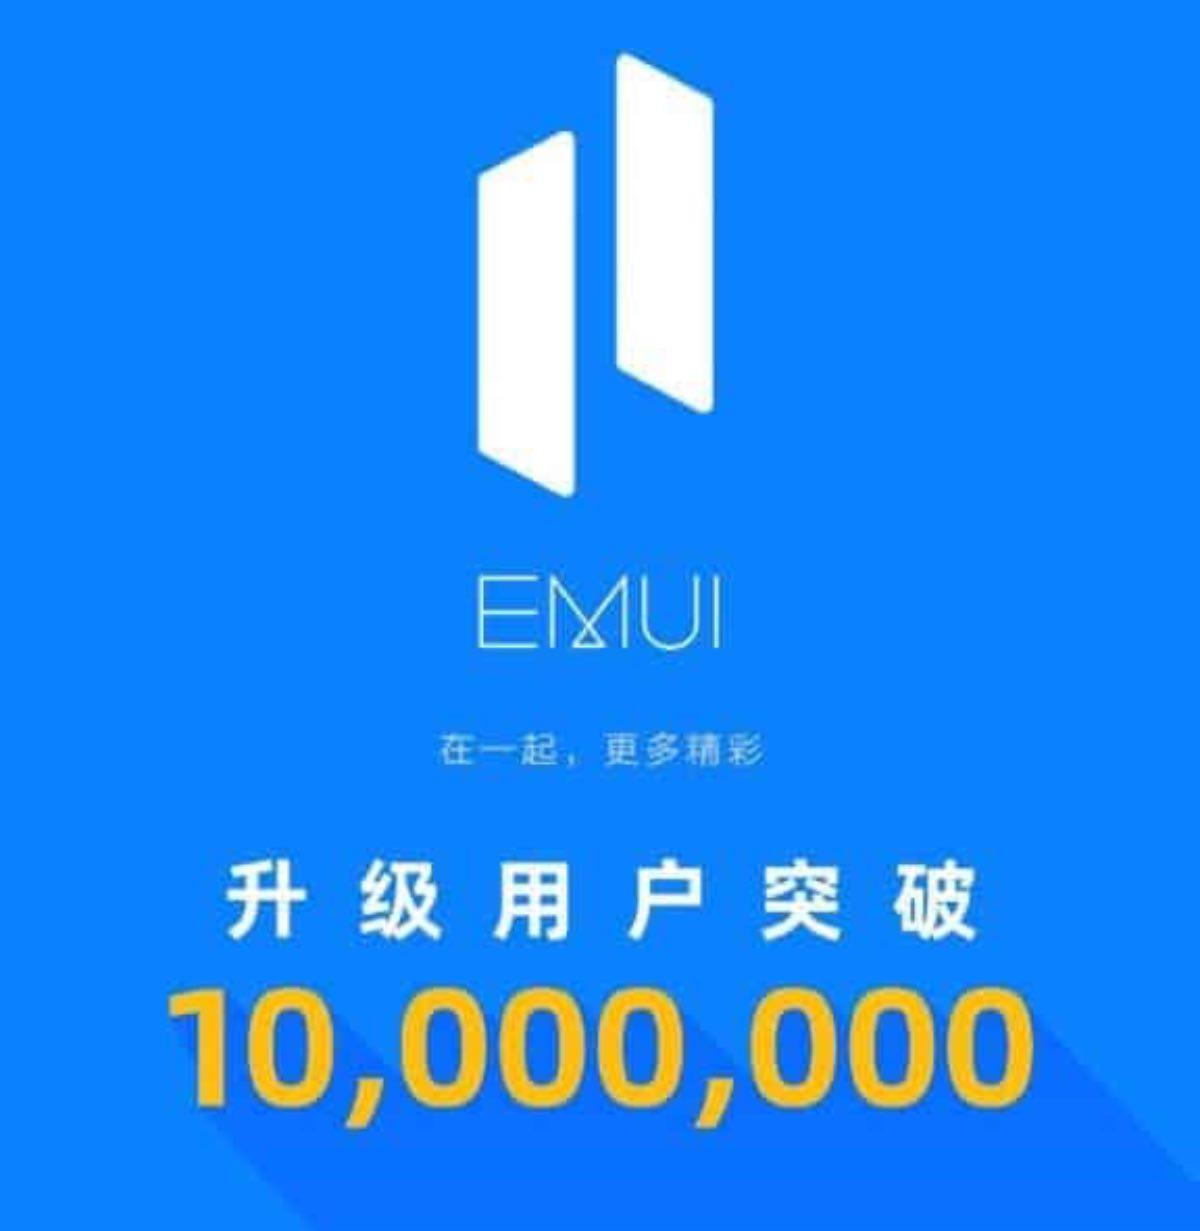 emui 11 global download